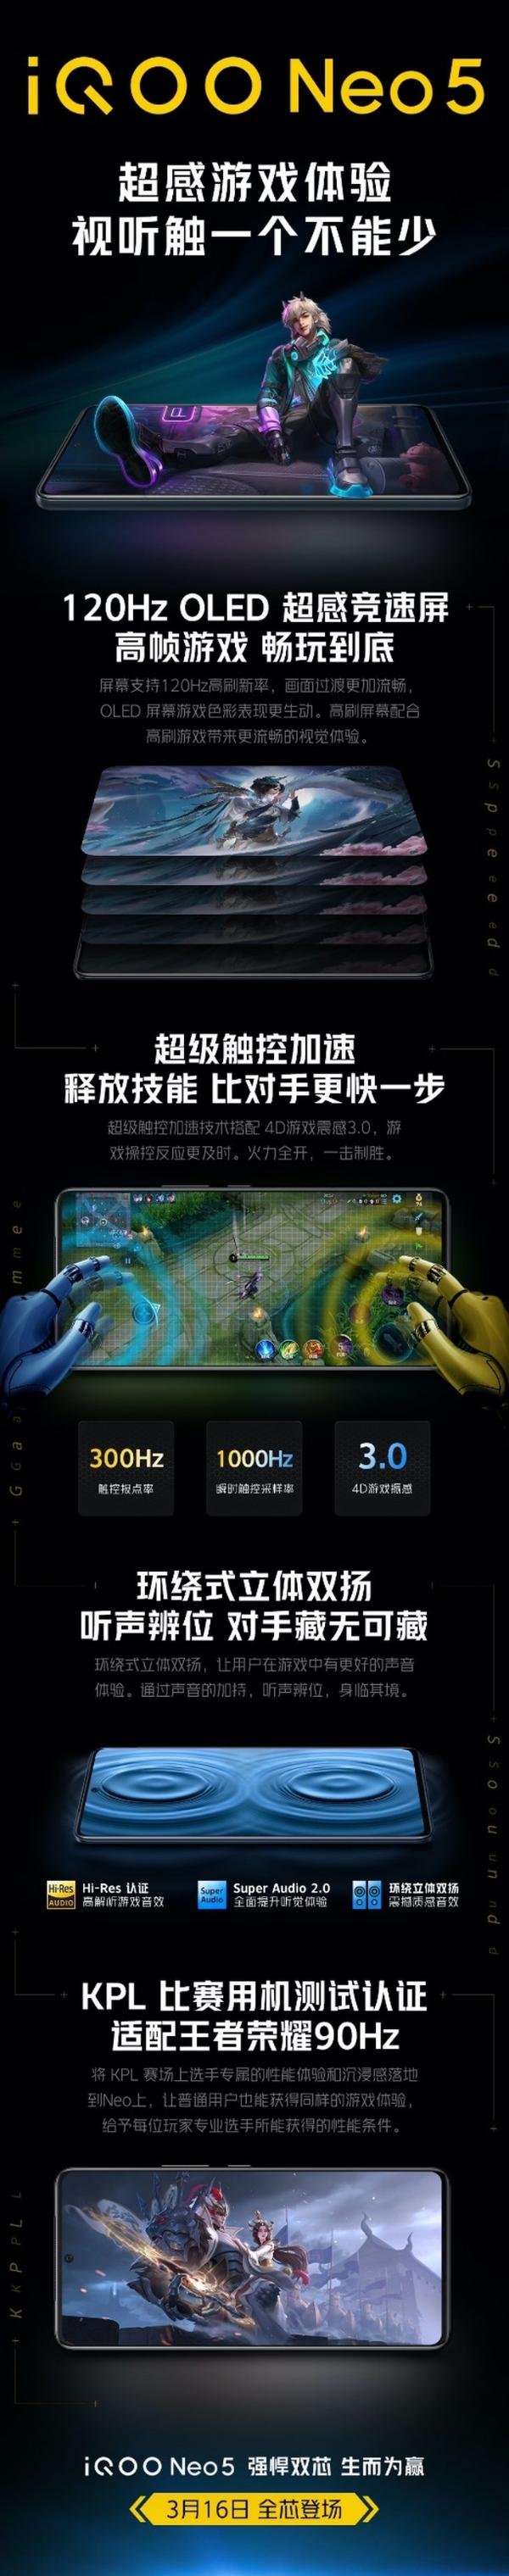 iQOO Neo 5真机爆料——轻薄机身高性能